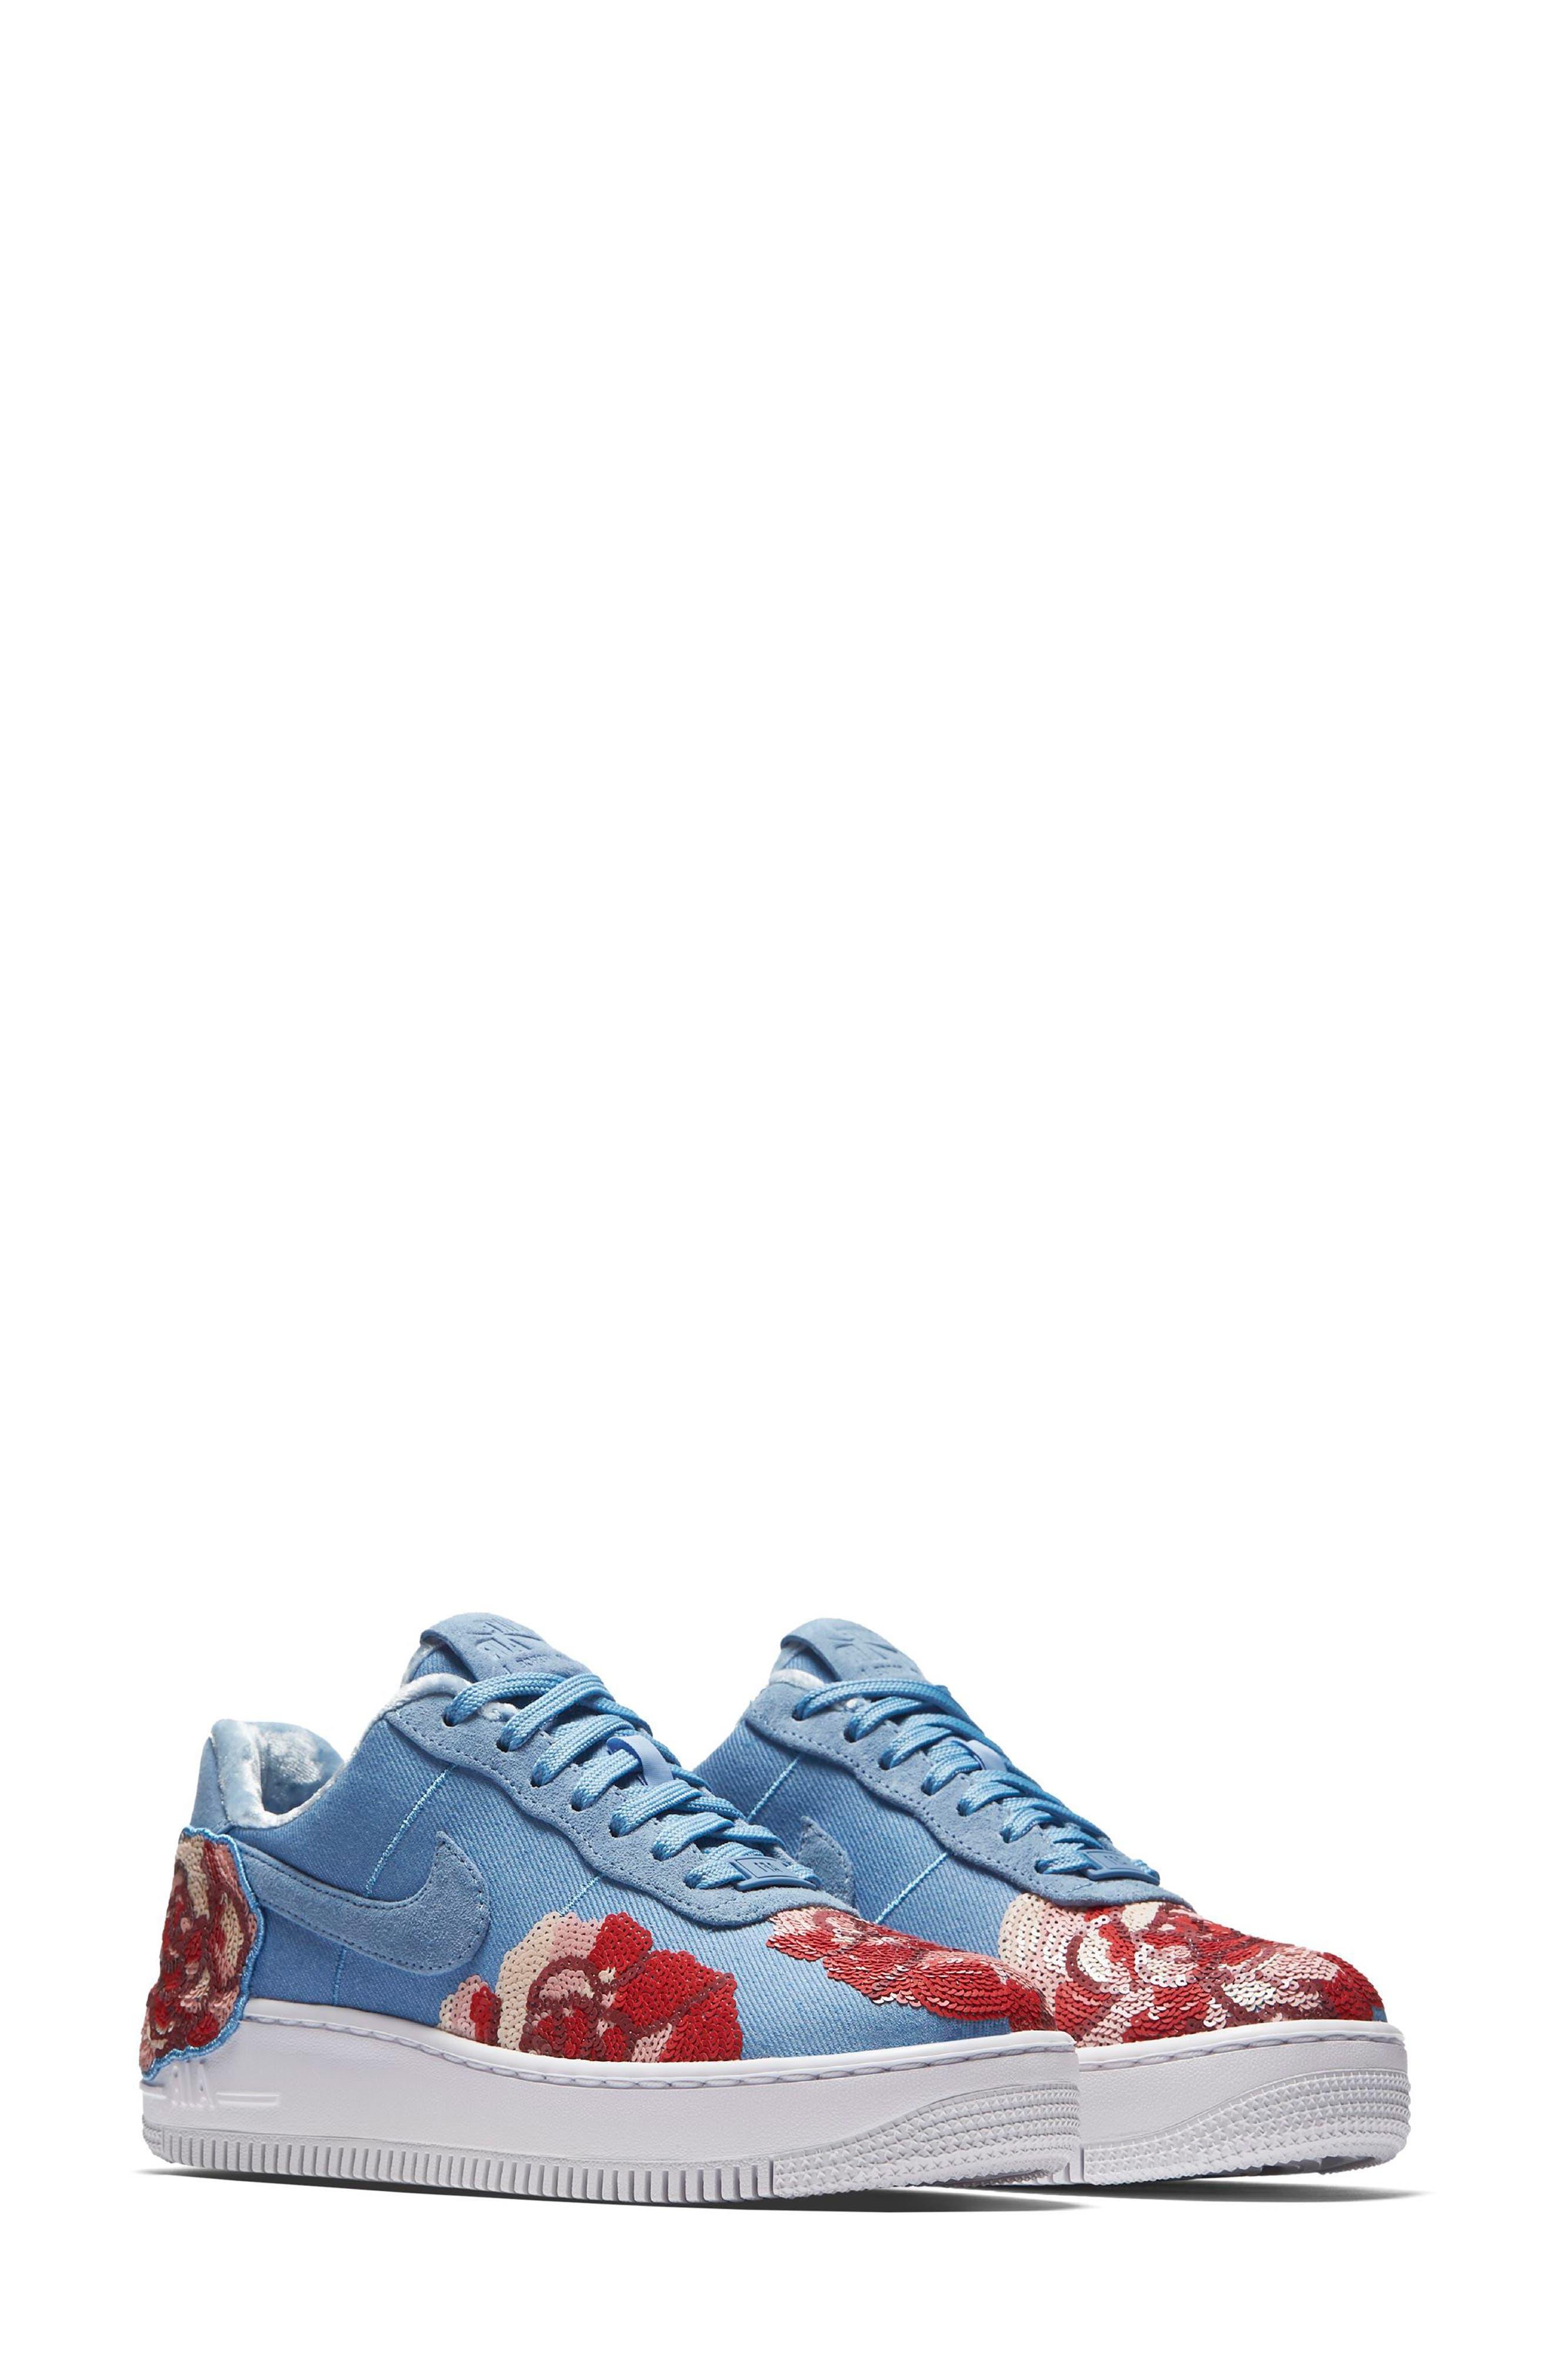 Main Image - Nike Women's Air Force 1 Upstep LX Shoe (Women)